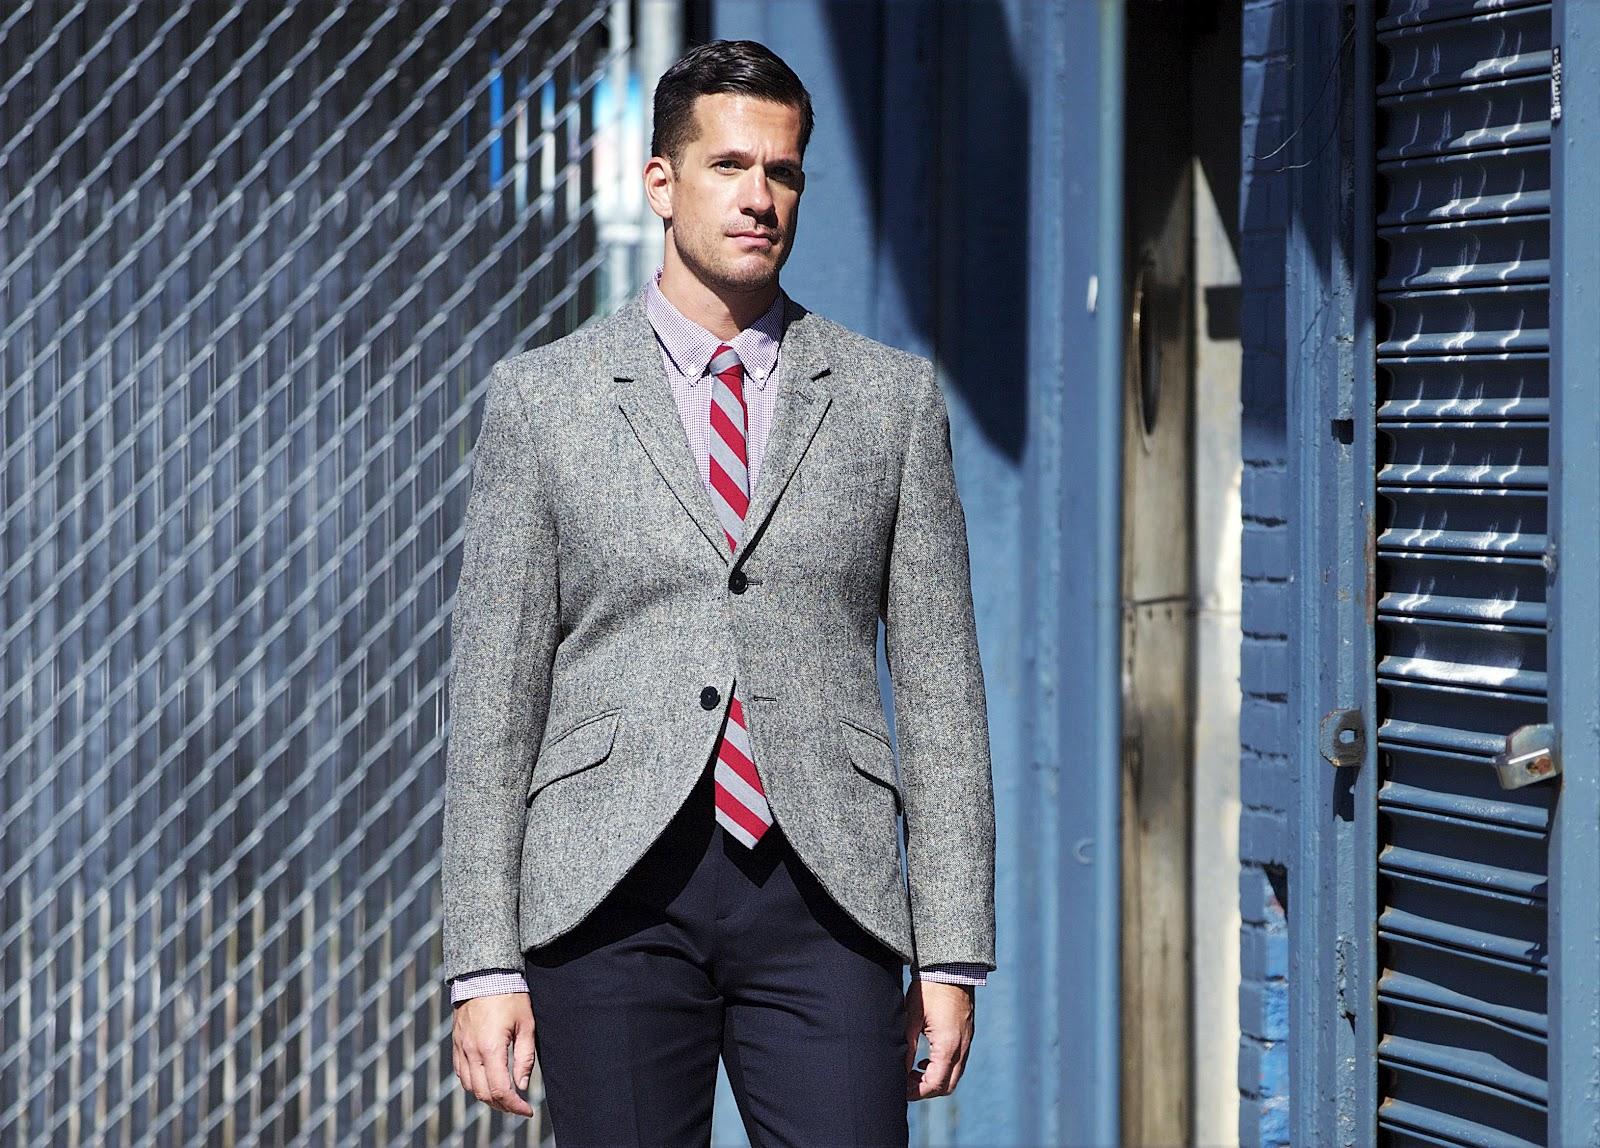 Shawl Collar Sweater Under Blazer a Shawl Collar Sweater